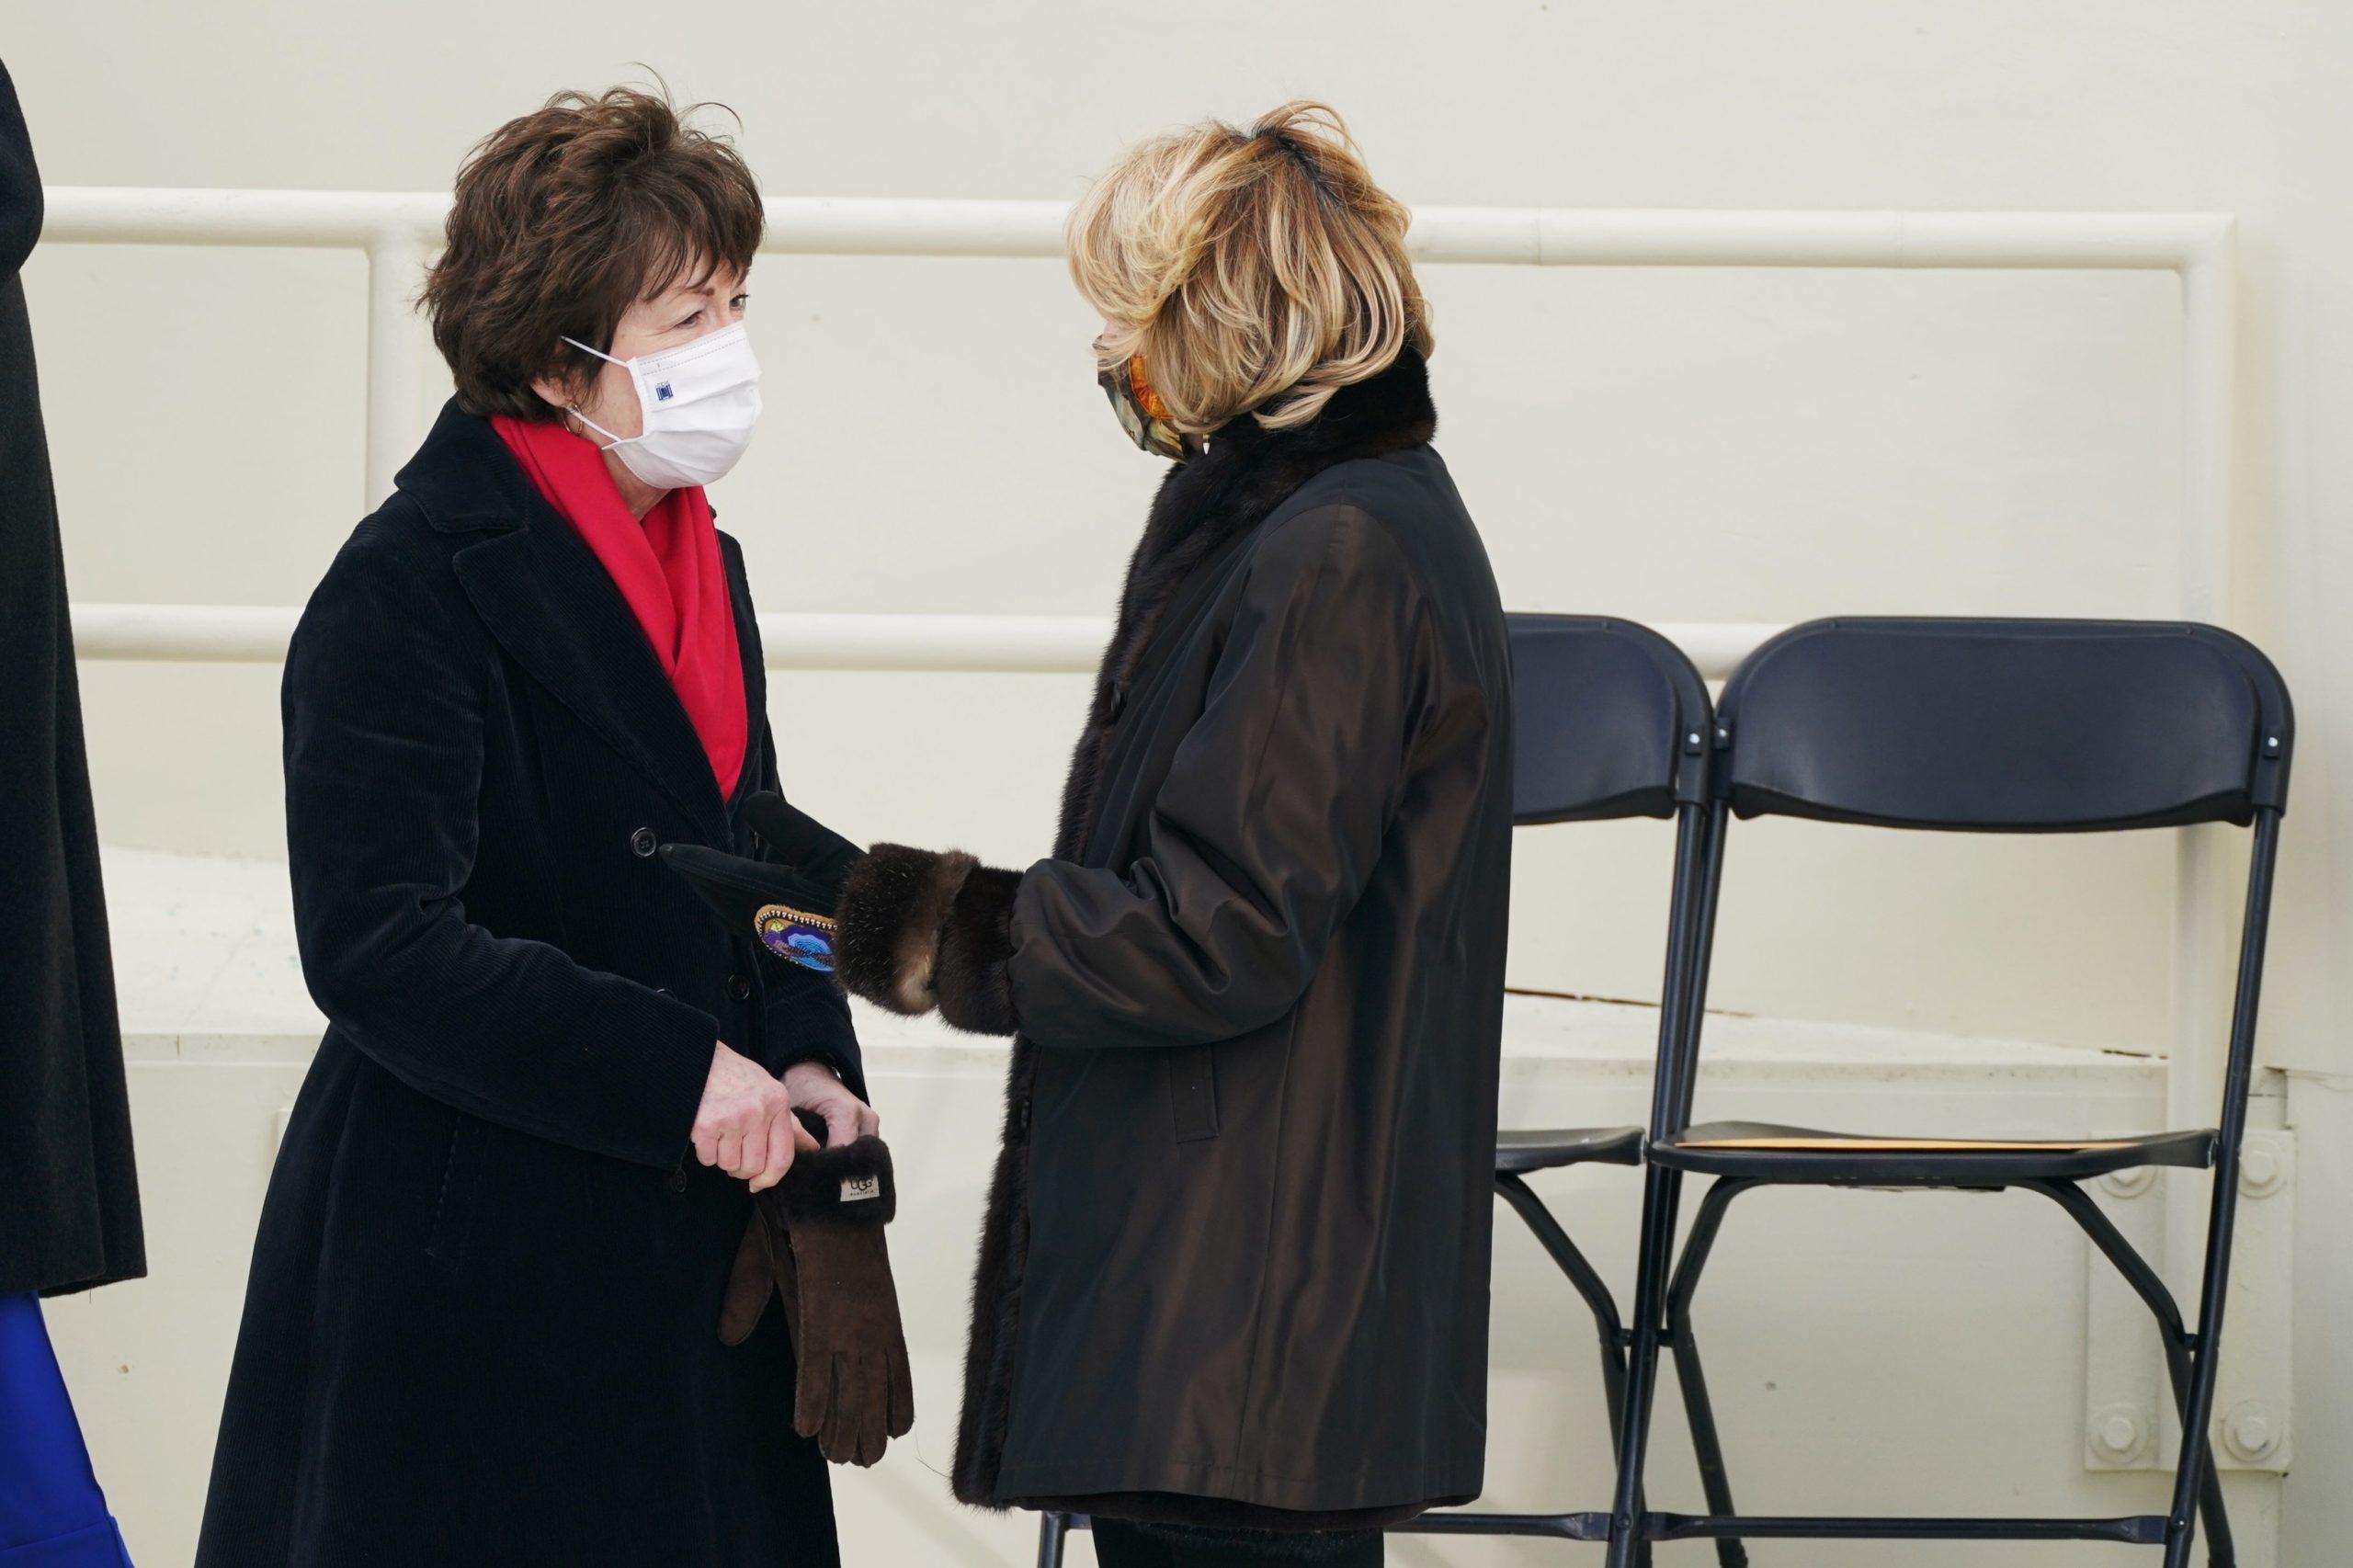 Sens. Susan Collins and Lisa Murkowski speak before President Joe Biden's inauguration ceremony at the Capitol on Jan. 20. (Patrick Semansky/Pool/AFP via Getty Images)